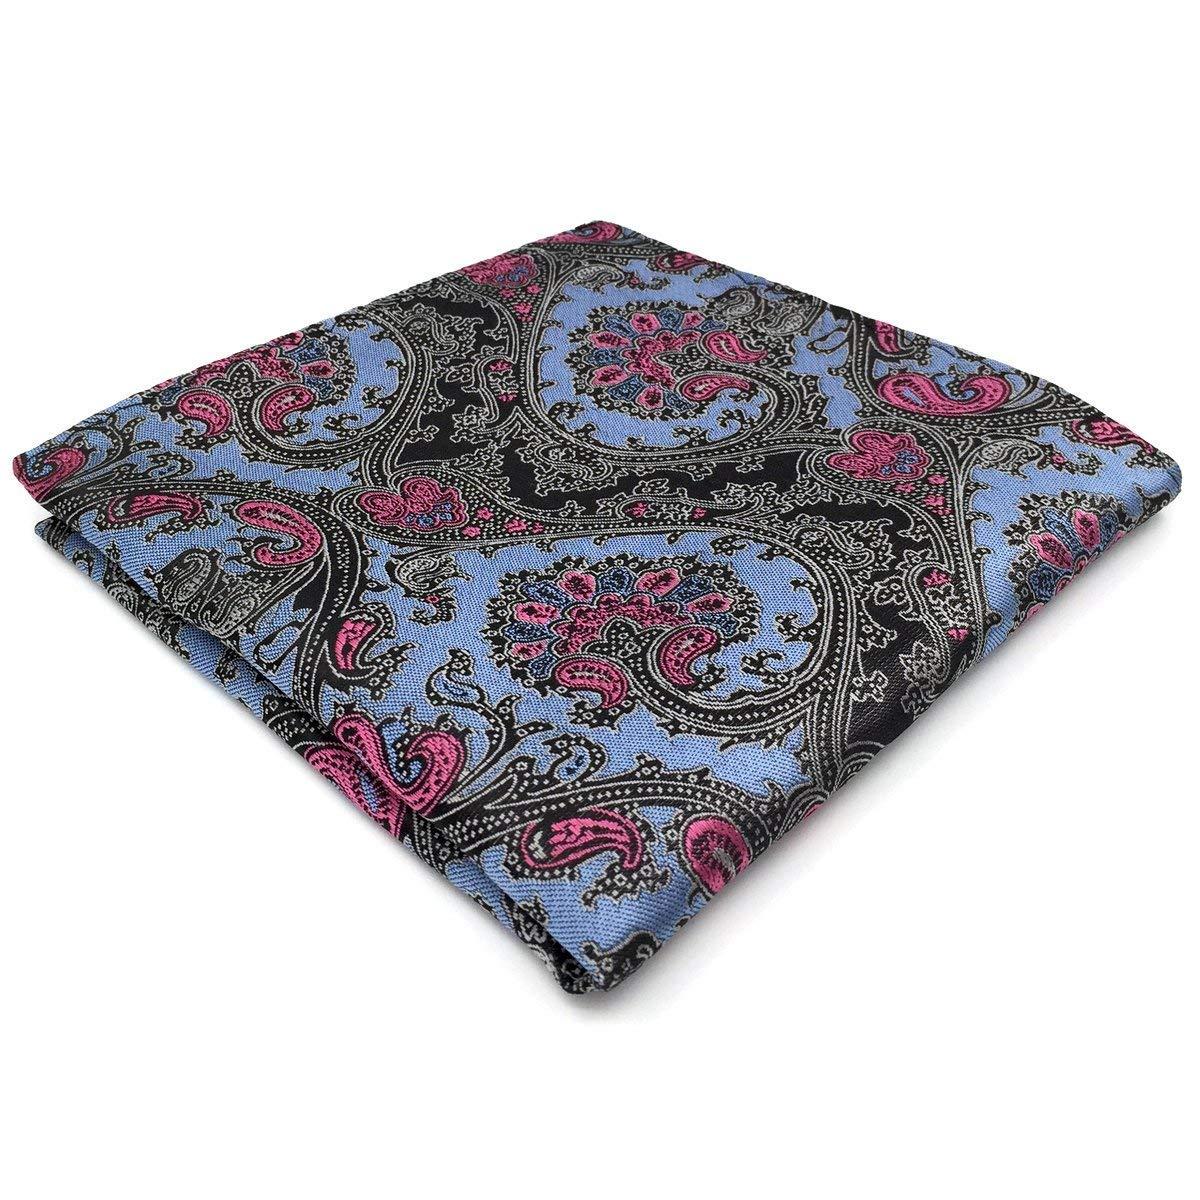 Shlax& Wing Paisley Blue Black Pink Pocket Square Mens Hankies Hanky PH31